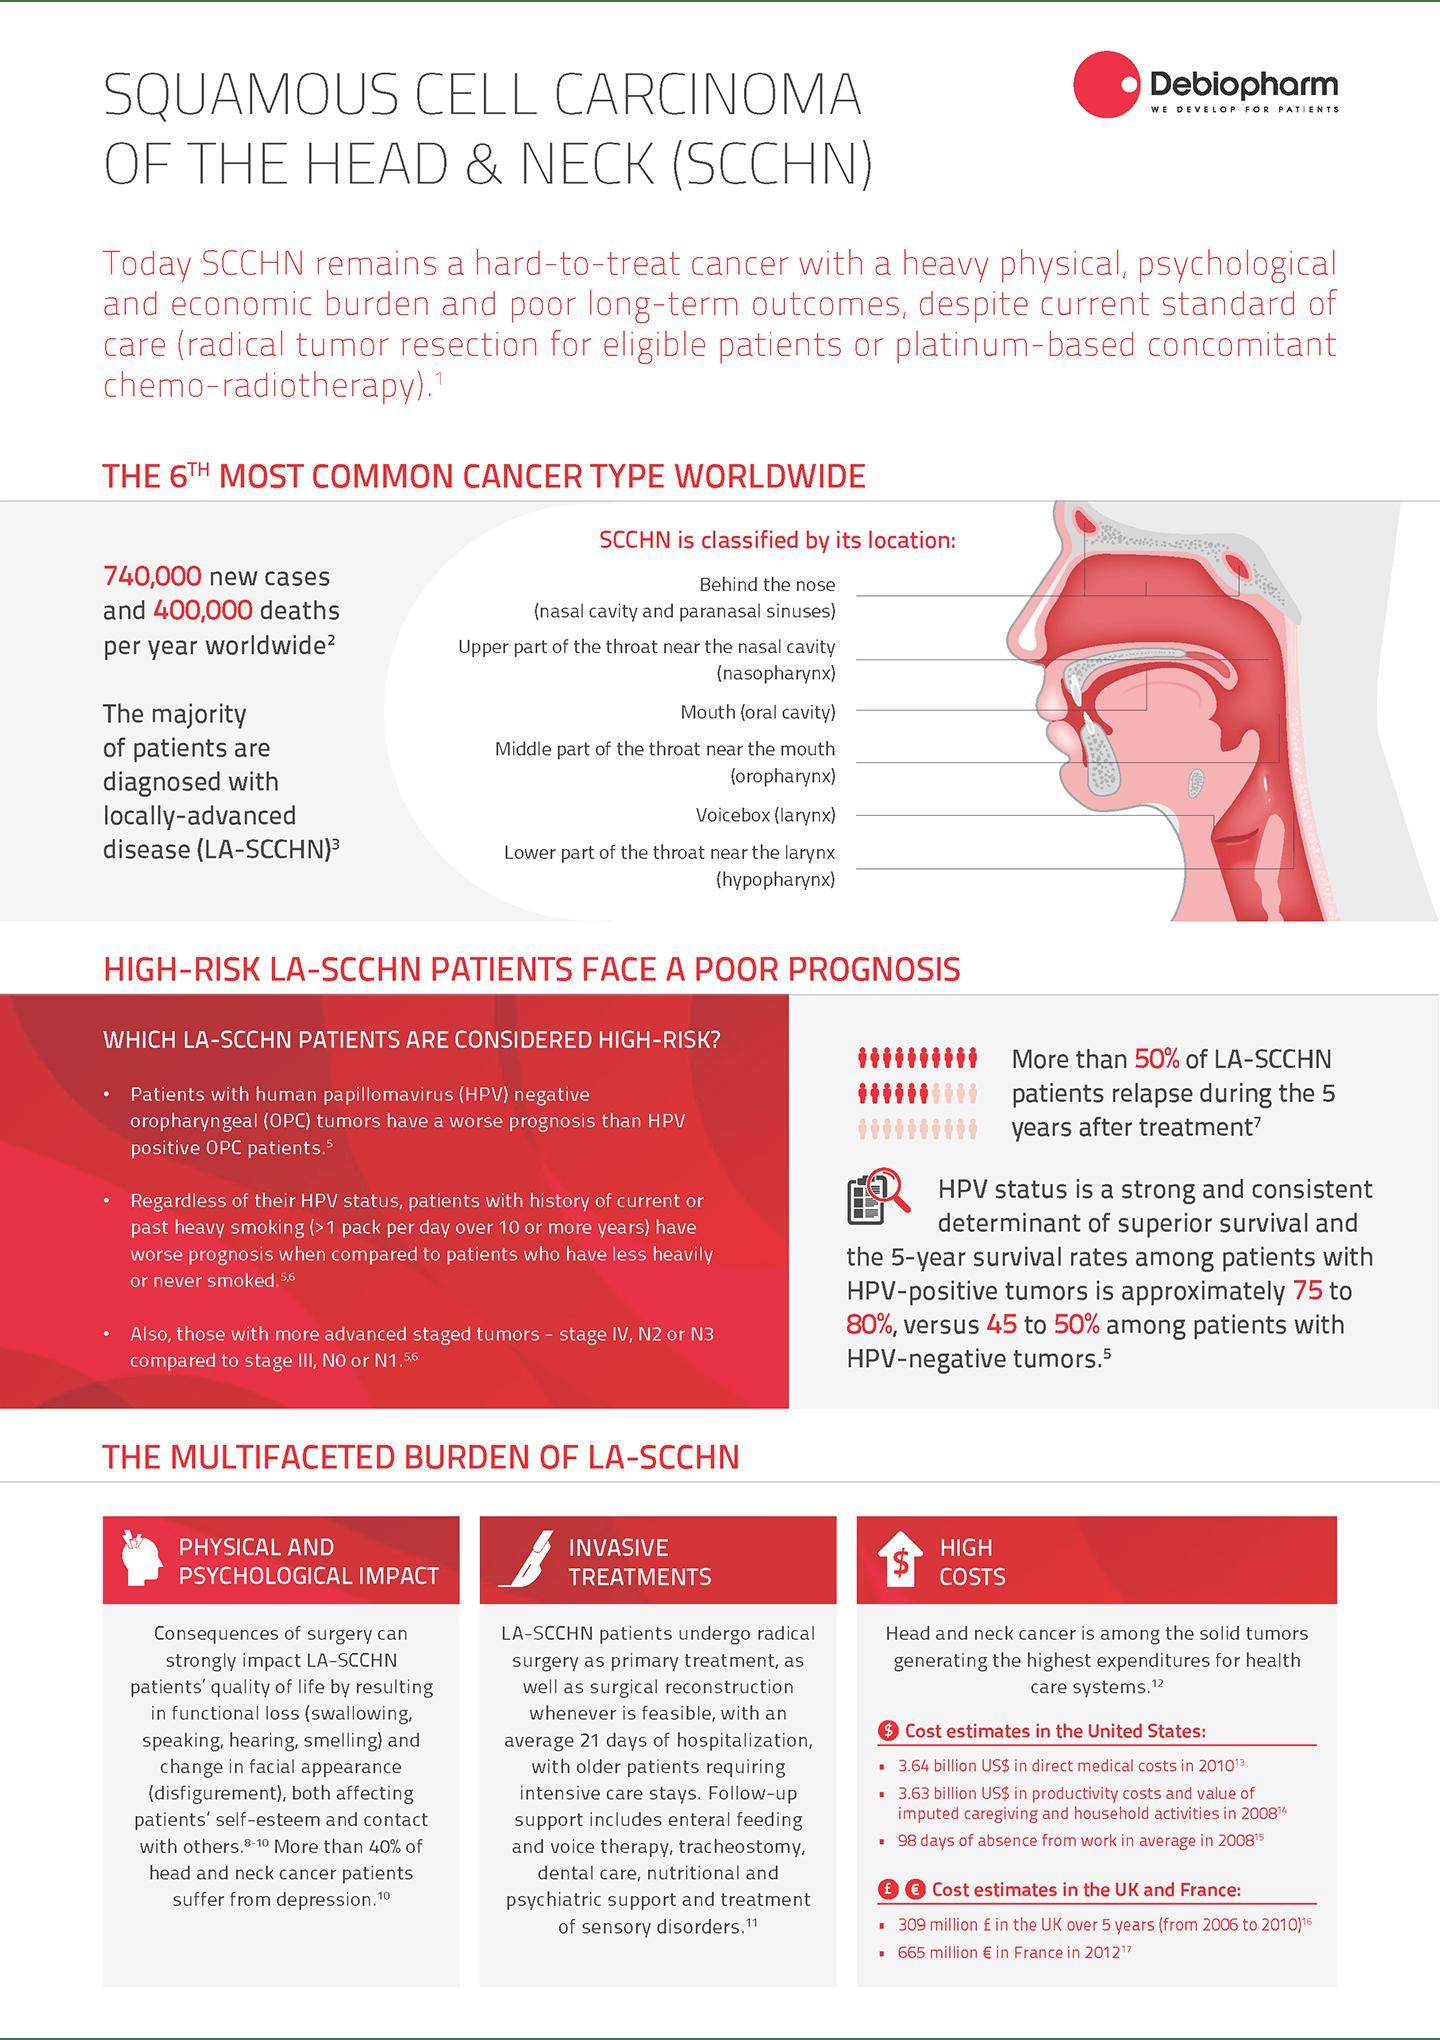 Debio 1143-Head&Neck-Infographic